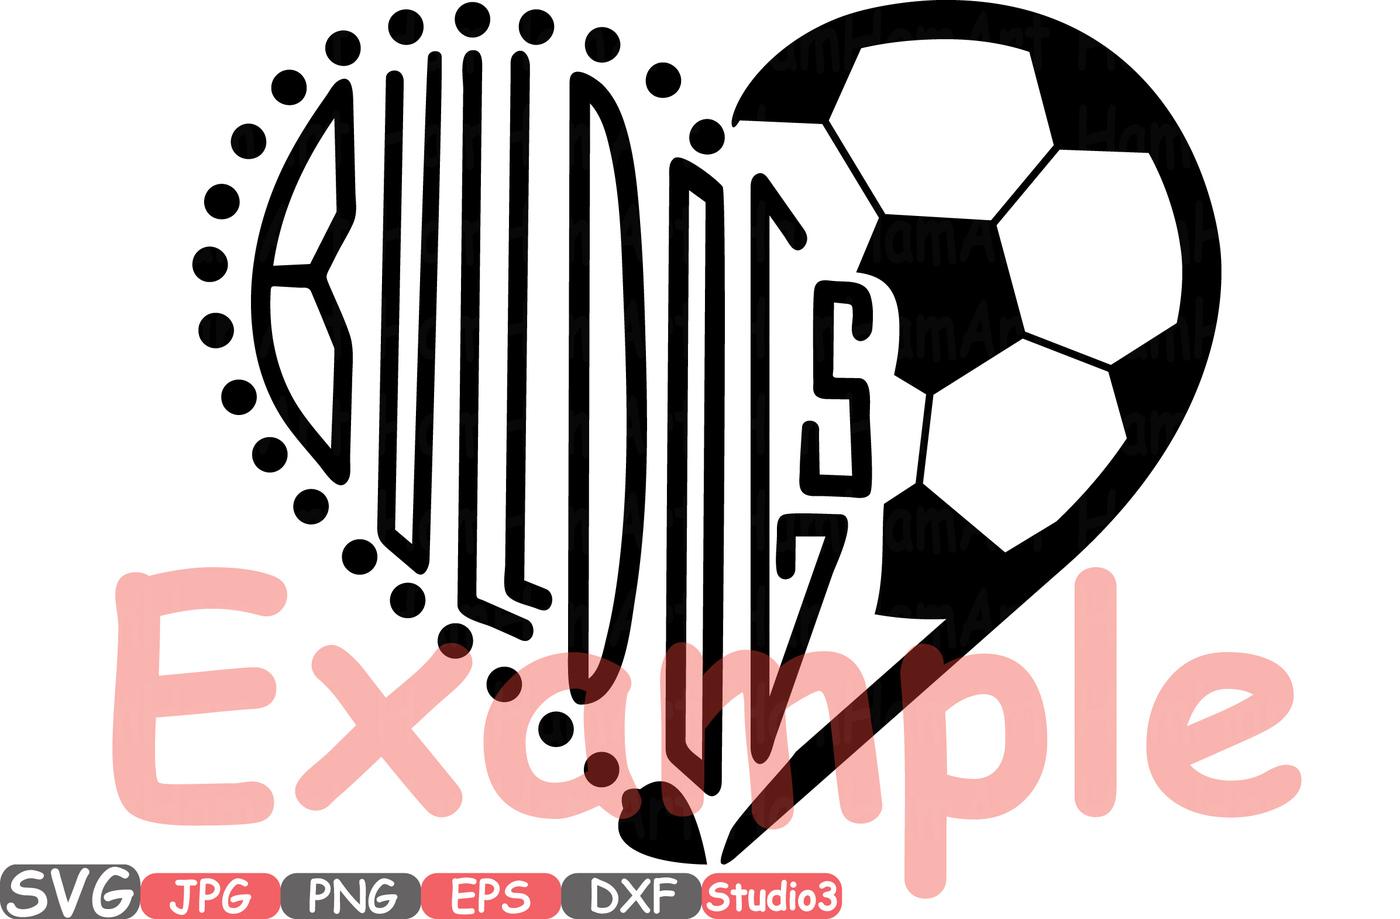 1400x919 Bulldogs Silhouette Svg Cutting Files Digital Clip Art Graphic